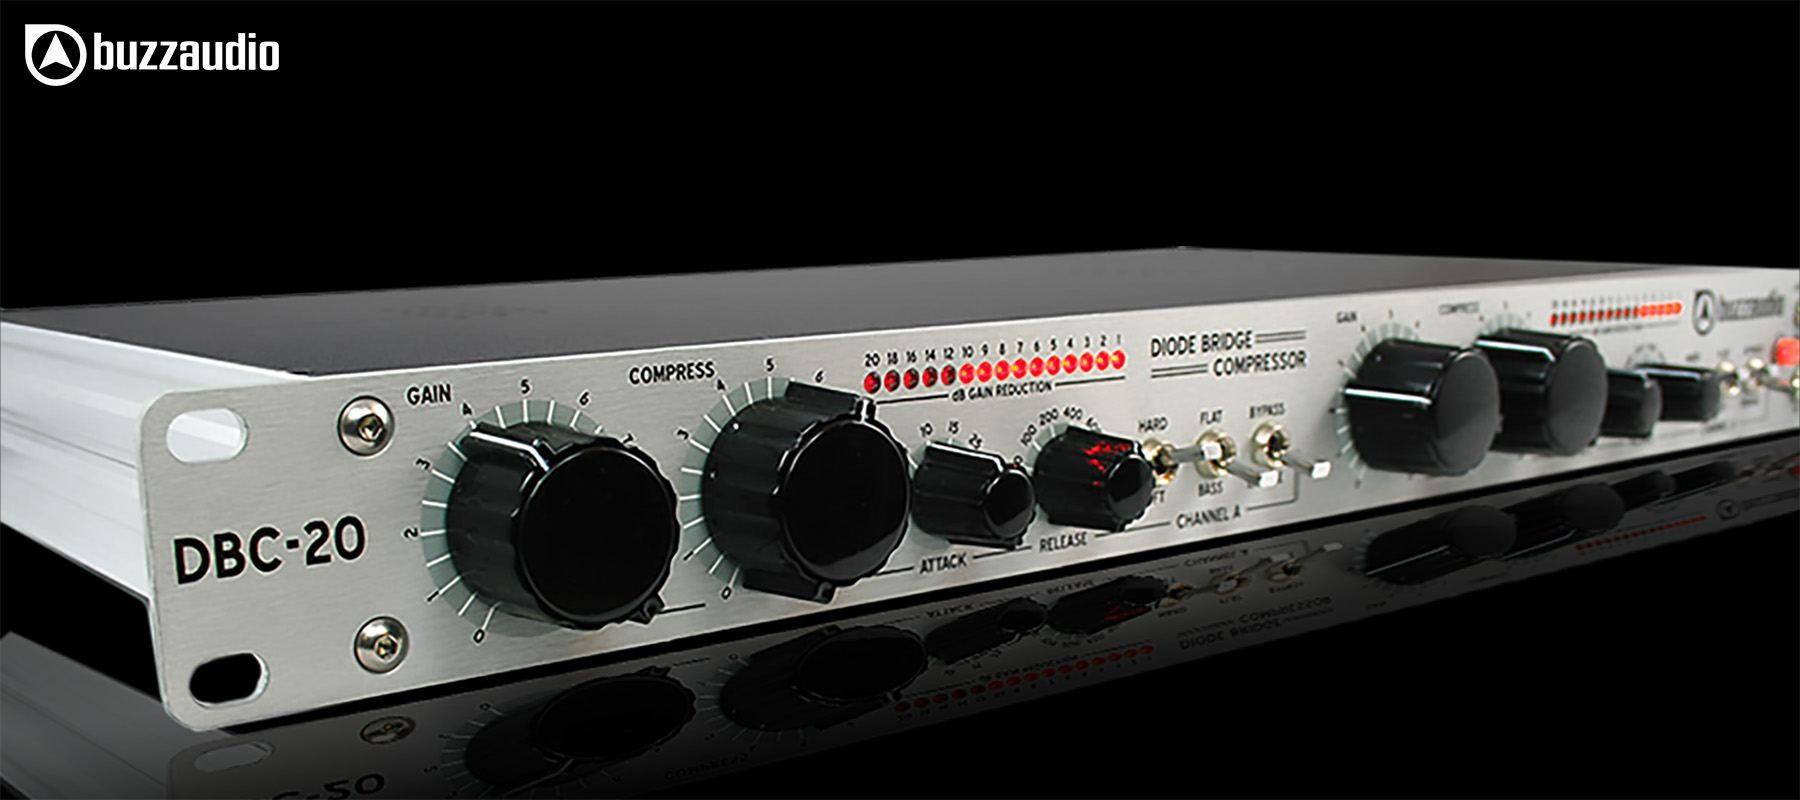 Buzz Audio DBC-20 - Argent